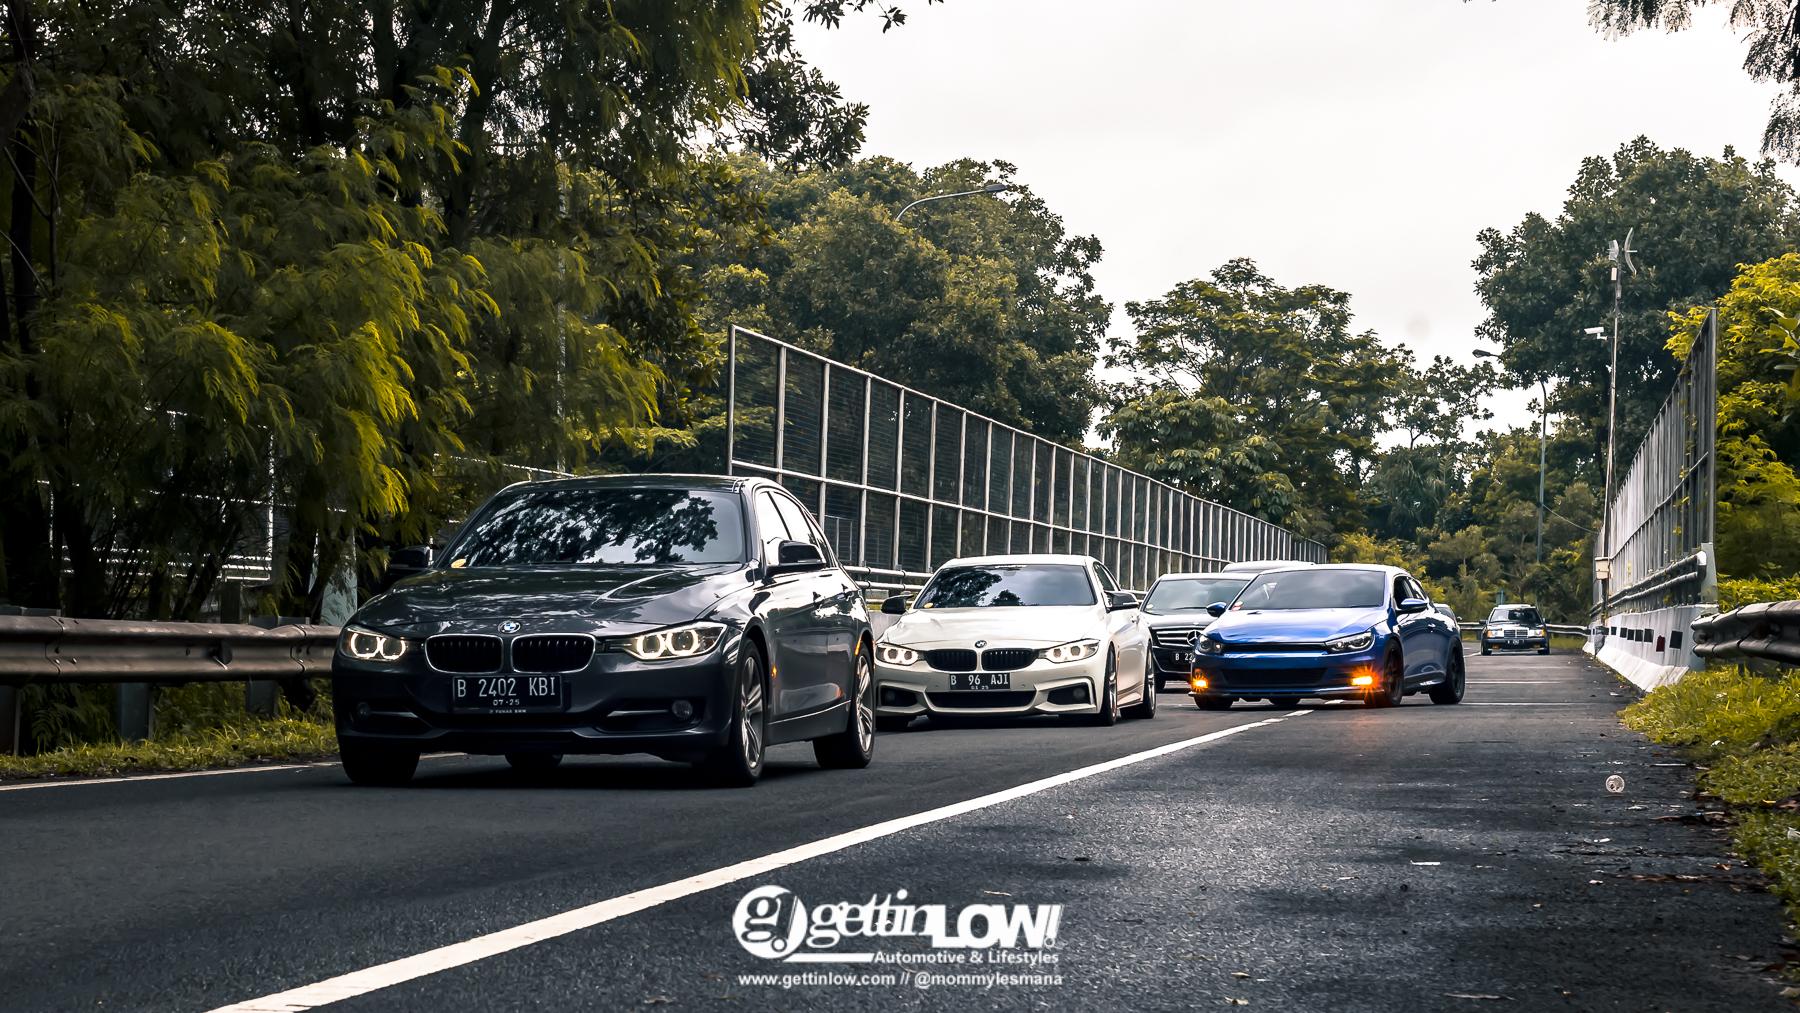 PGV Weekend Drive & Meet, 21 February 2021